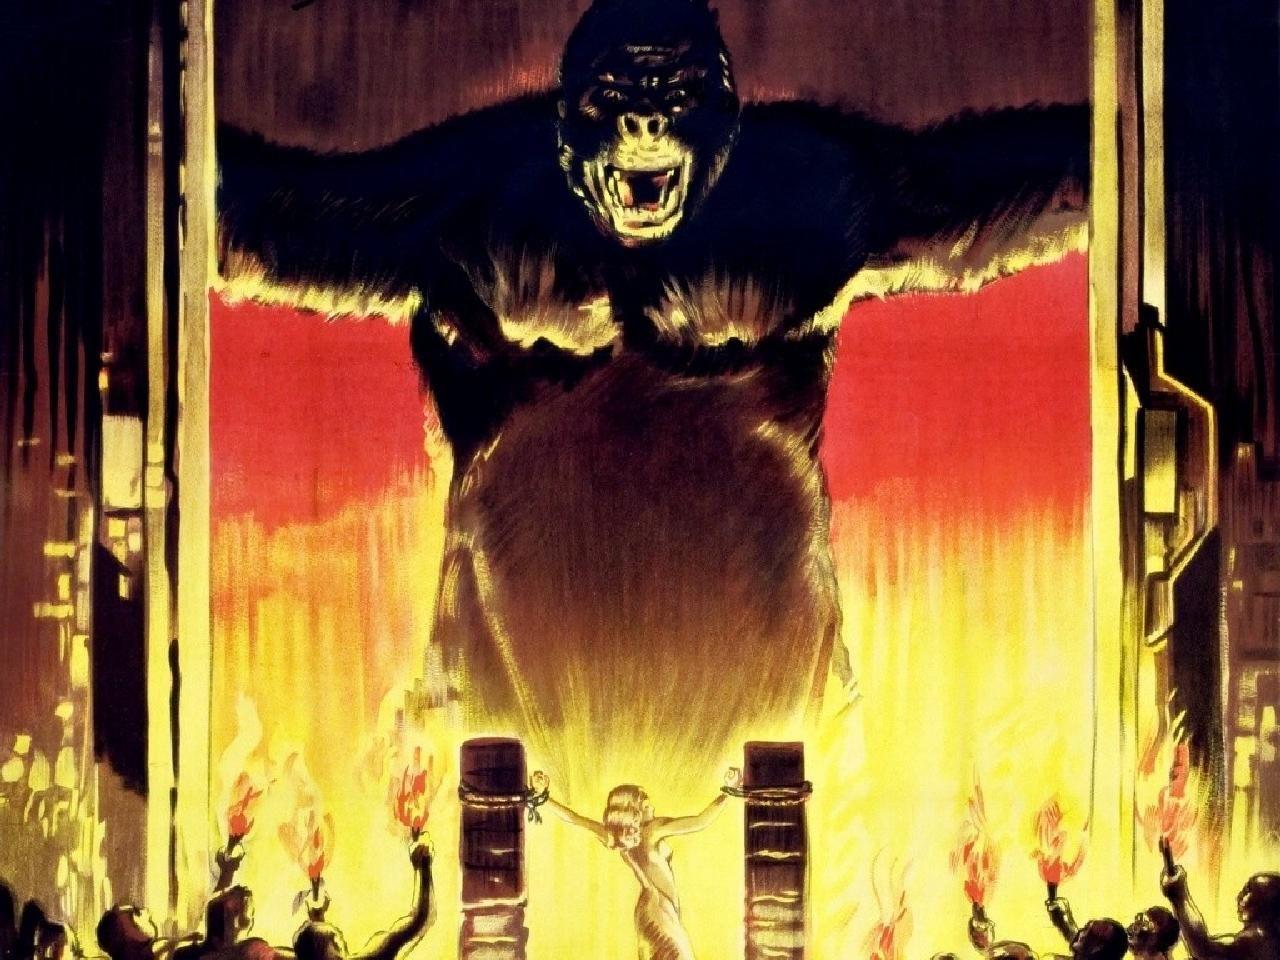 King Kong 1933 Wallpapers Hd King Kong 1933 King Kong Kong